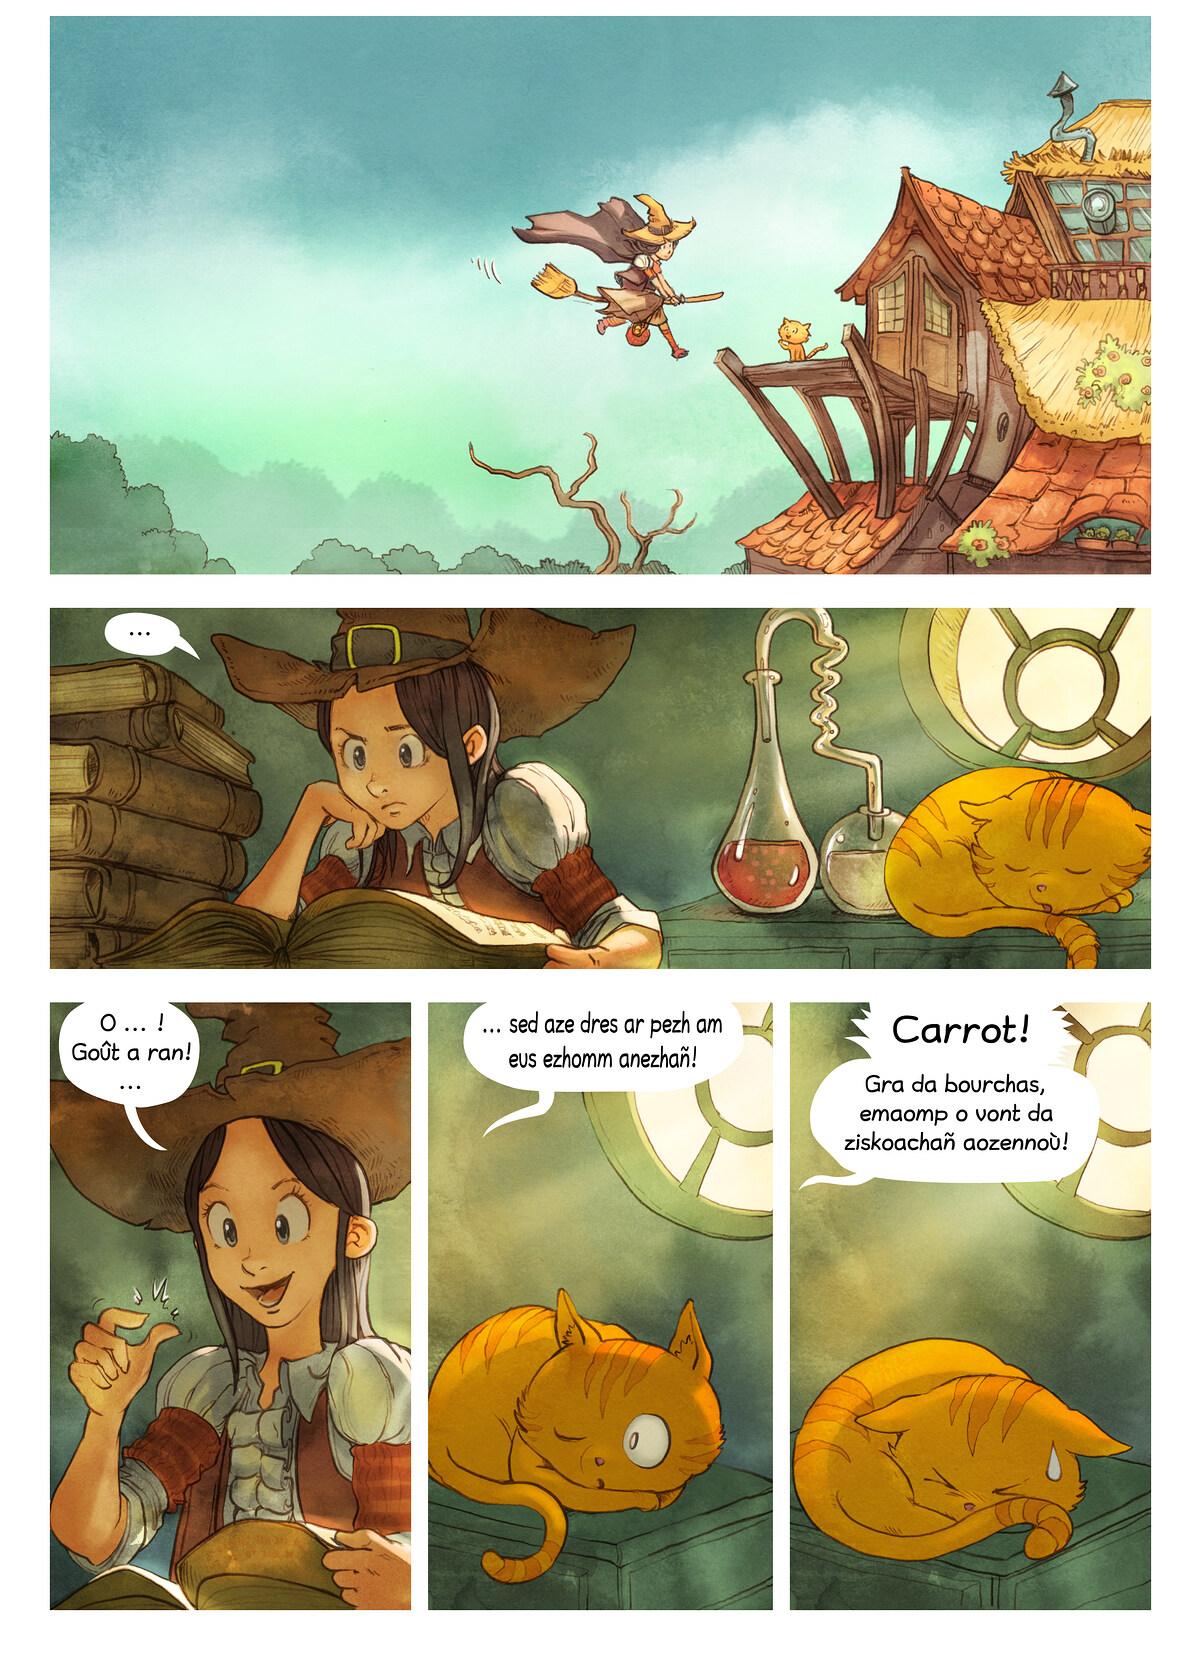 A webcomic page of Pepper&Carrot, rann 3 [br], pajenn 4